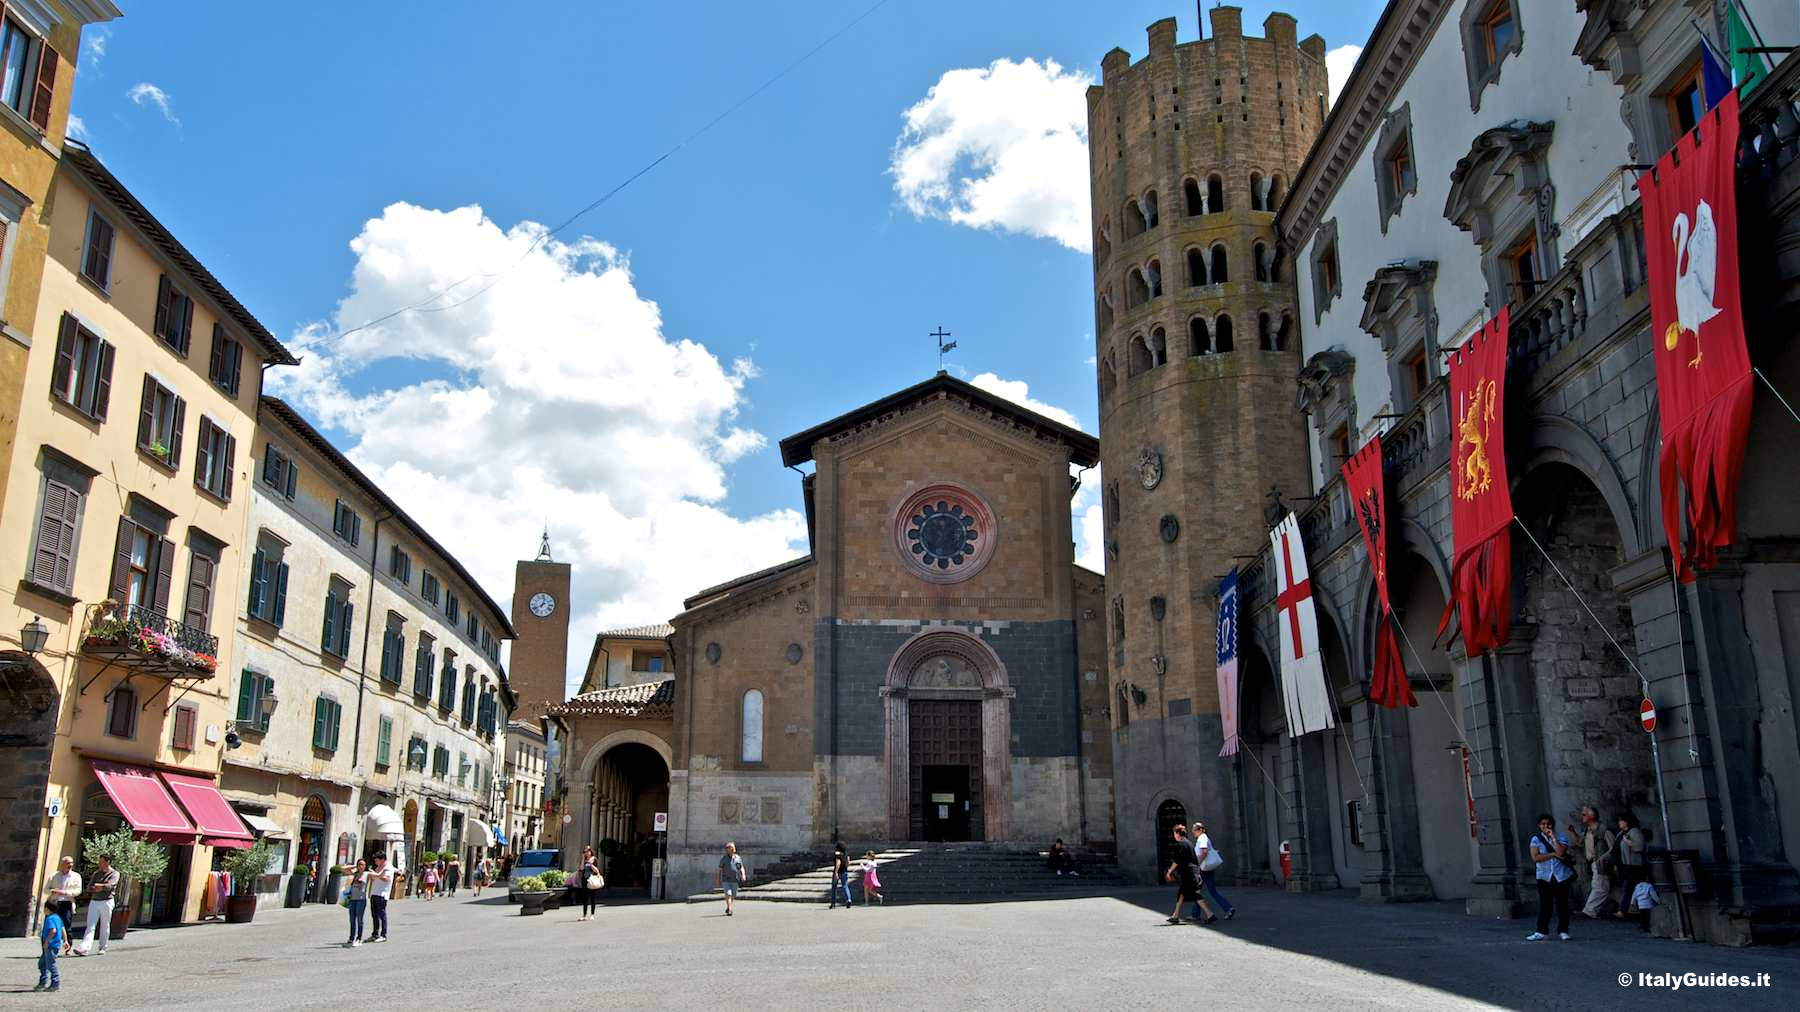 Le foto di Orvieto galleria fotografica  ItalyGuidesit